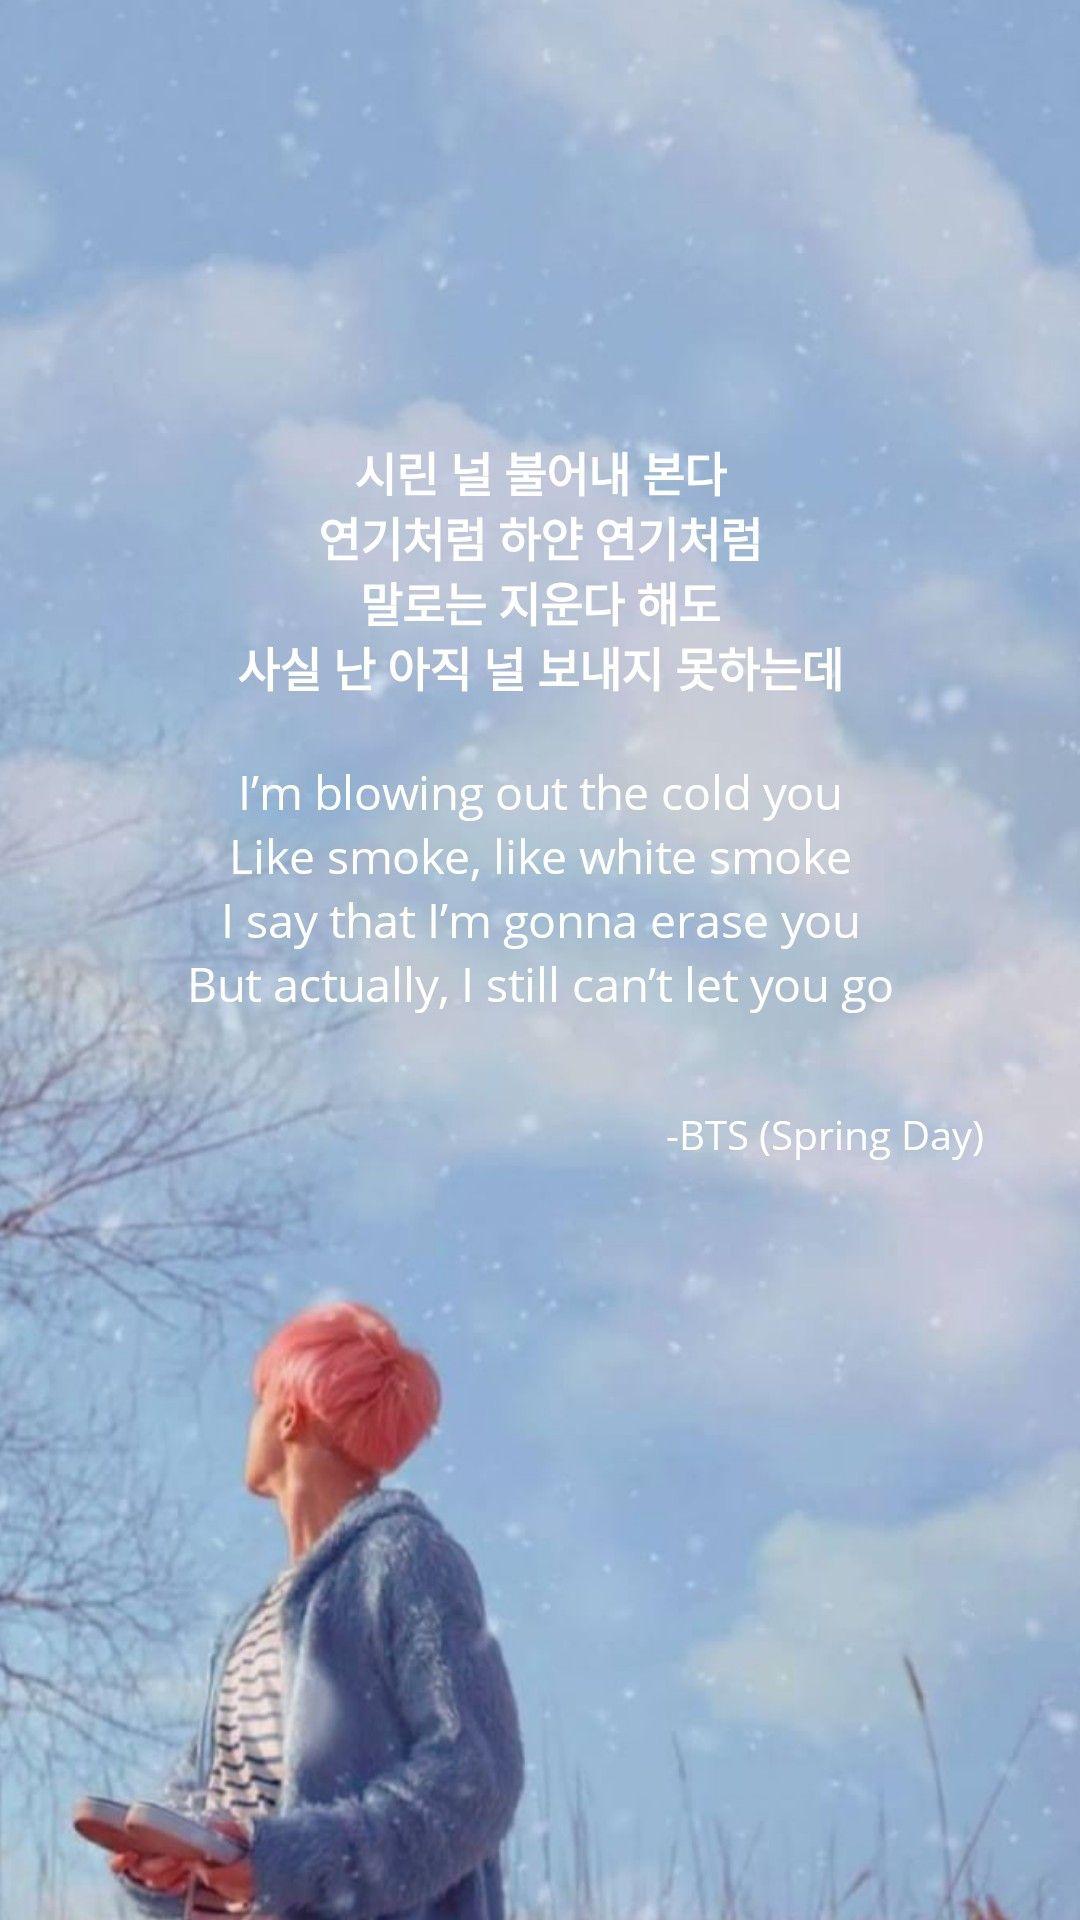 Spring Day Bts Lyrics Bts Lyric Bts Wallpaper Lyrics Bts Lyrics Quotes